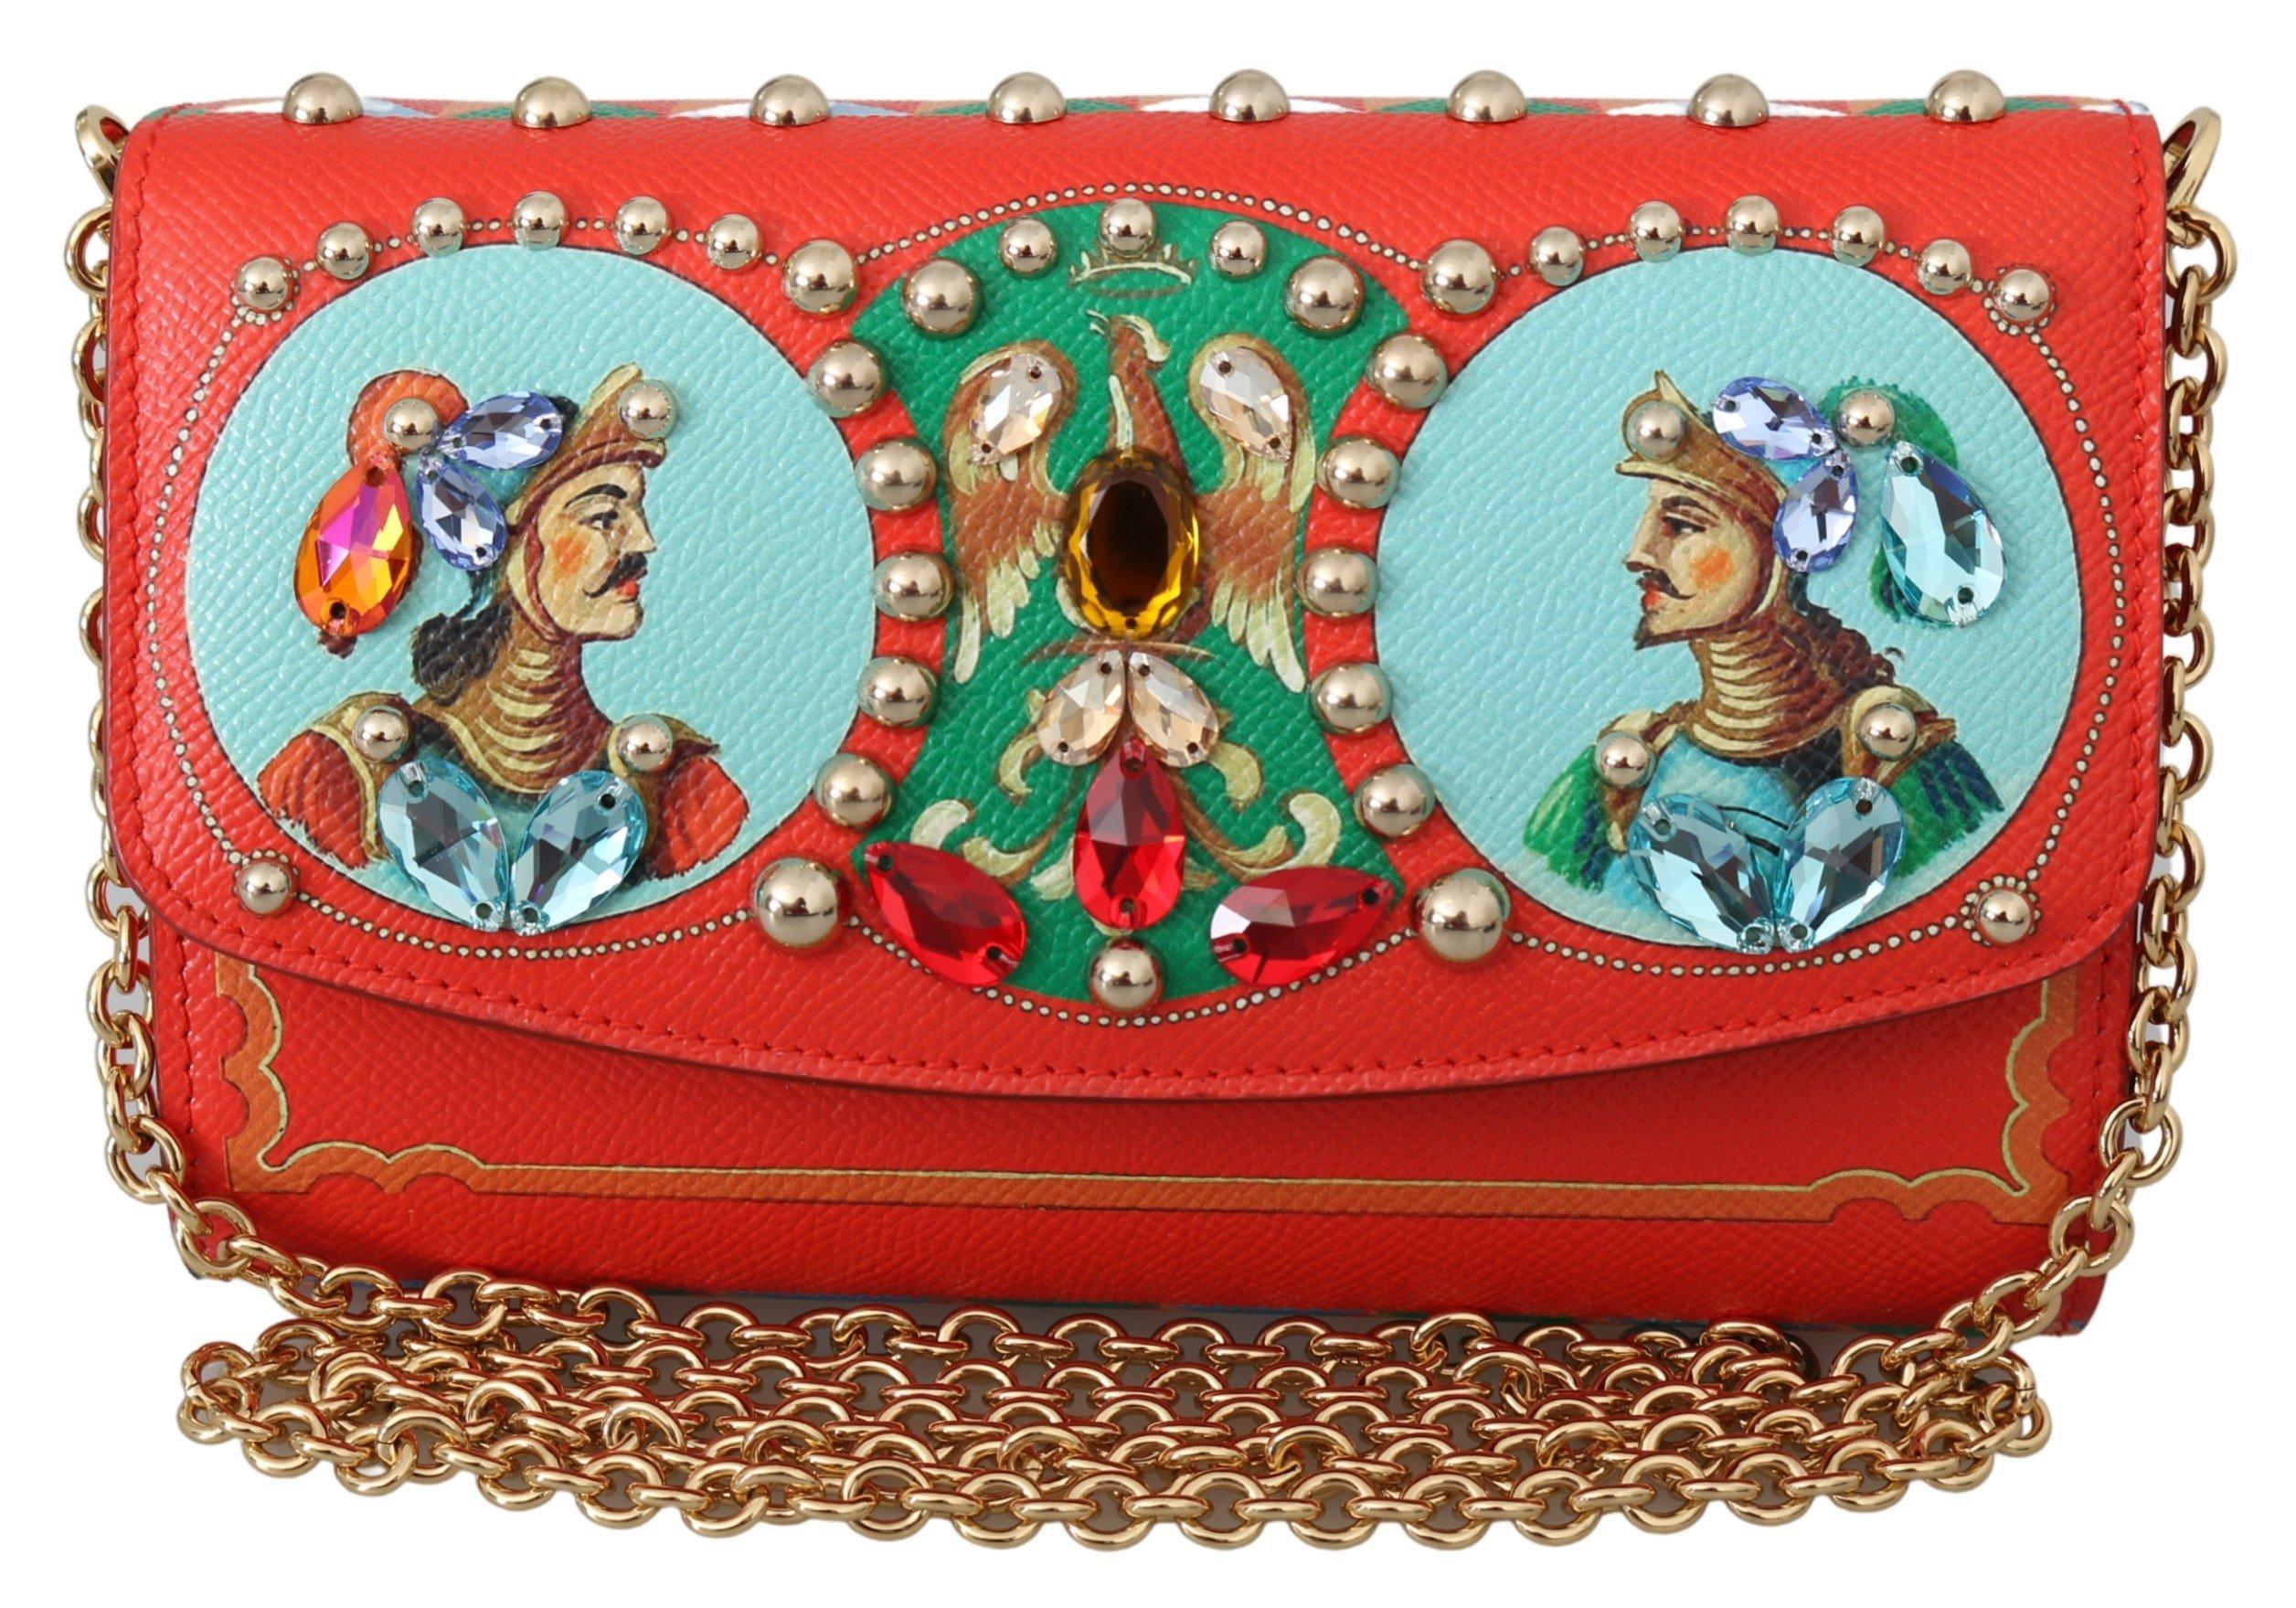 Dolce & Gabbana Women's Crystal Sicily Leather Clutch Bag Red VAS9916